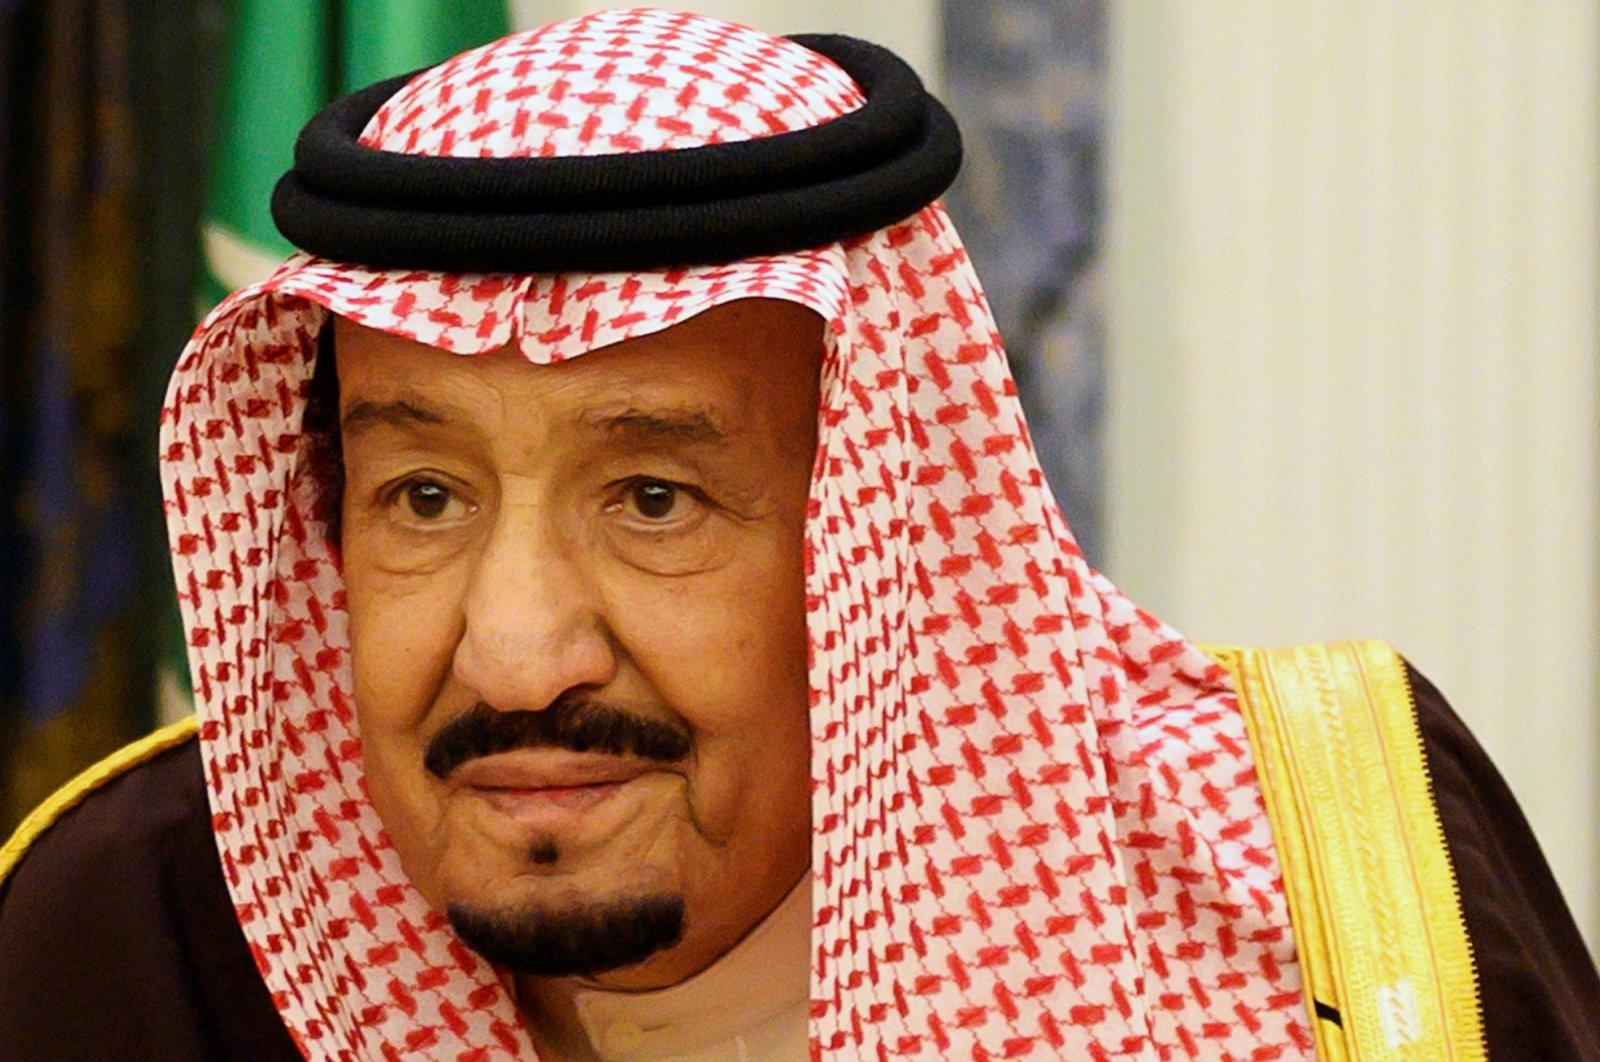 Saudi Arabia's King Salman bin Abdulaziz, Riyadh, Jan. 14, 2019. (REUTERS Photo)